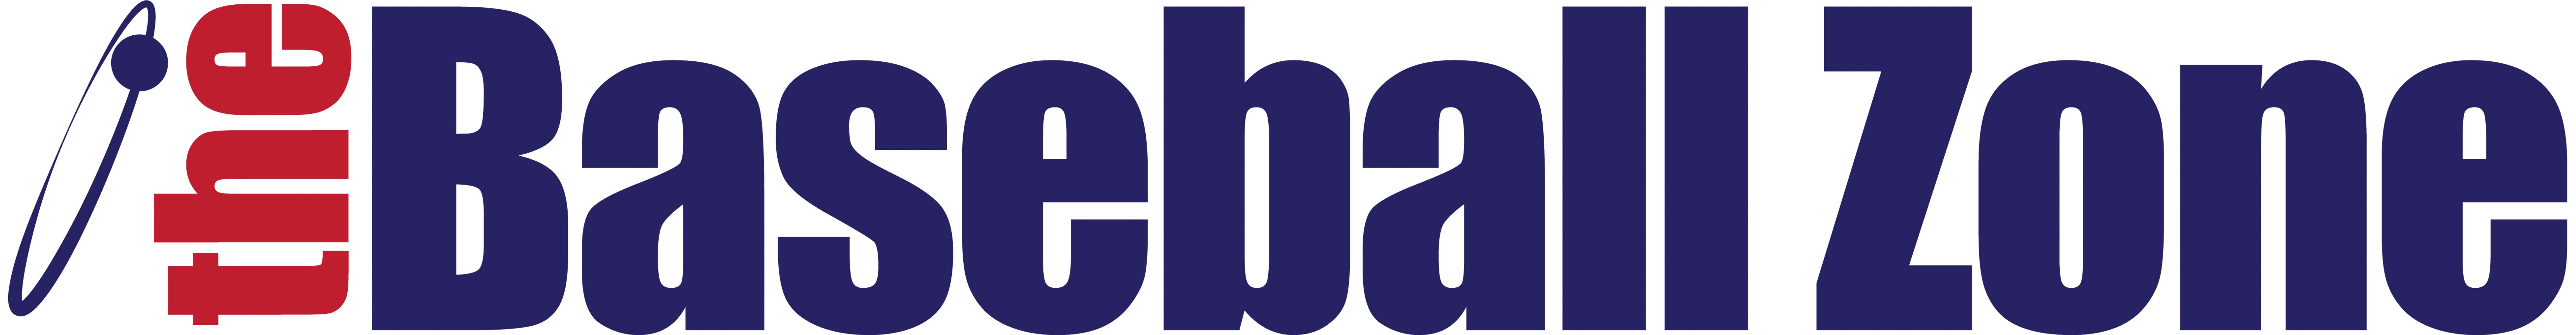 baseball-logo-1.png